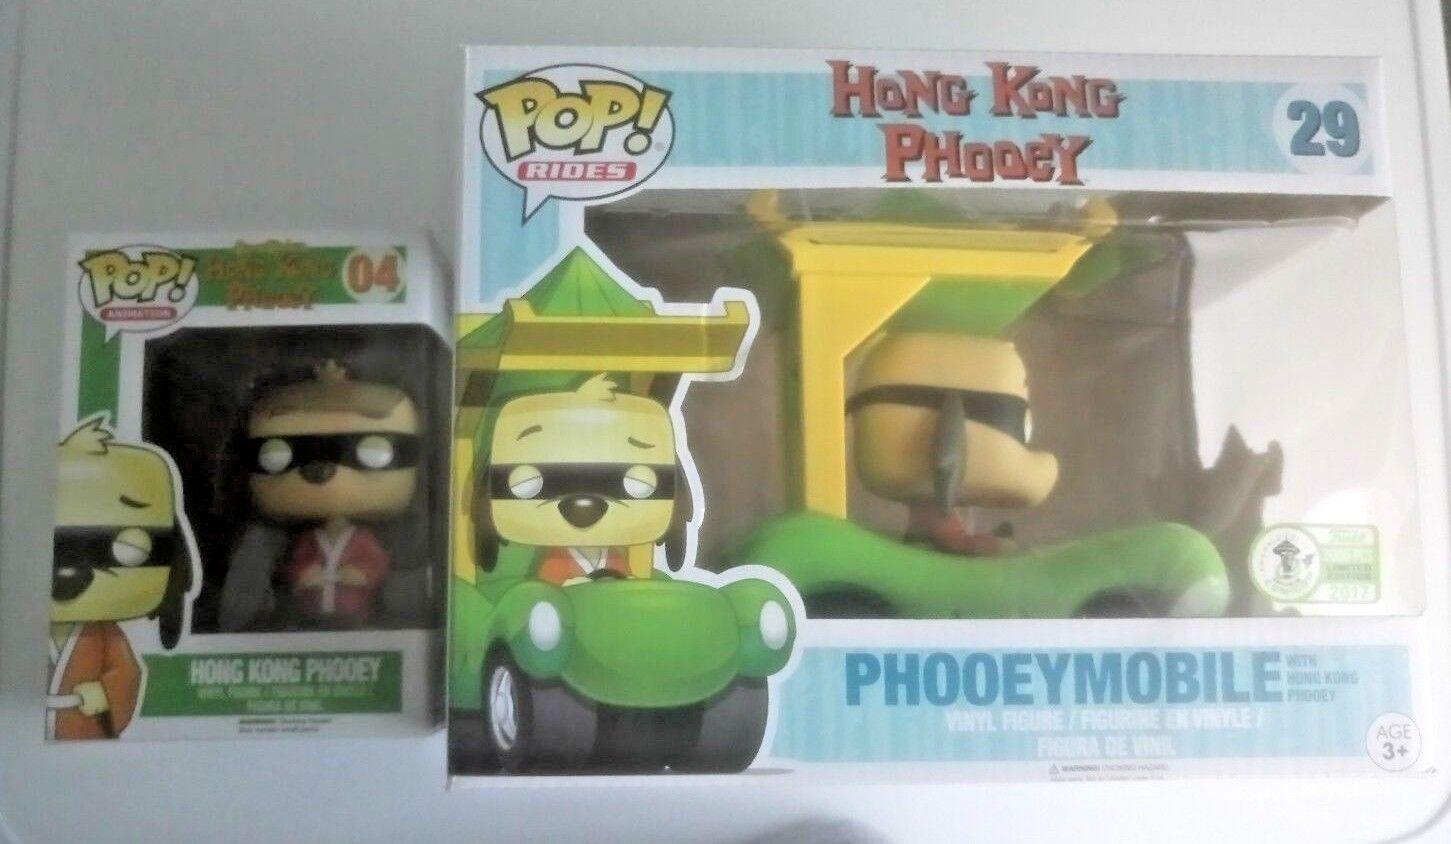 Funko Funko Funko POP Hong Kong Phooey (Rare & Vaulted) + ECCC 2017 Phooeymobile 1 of 3000 6b47f4